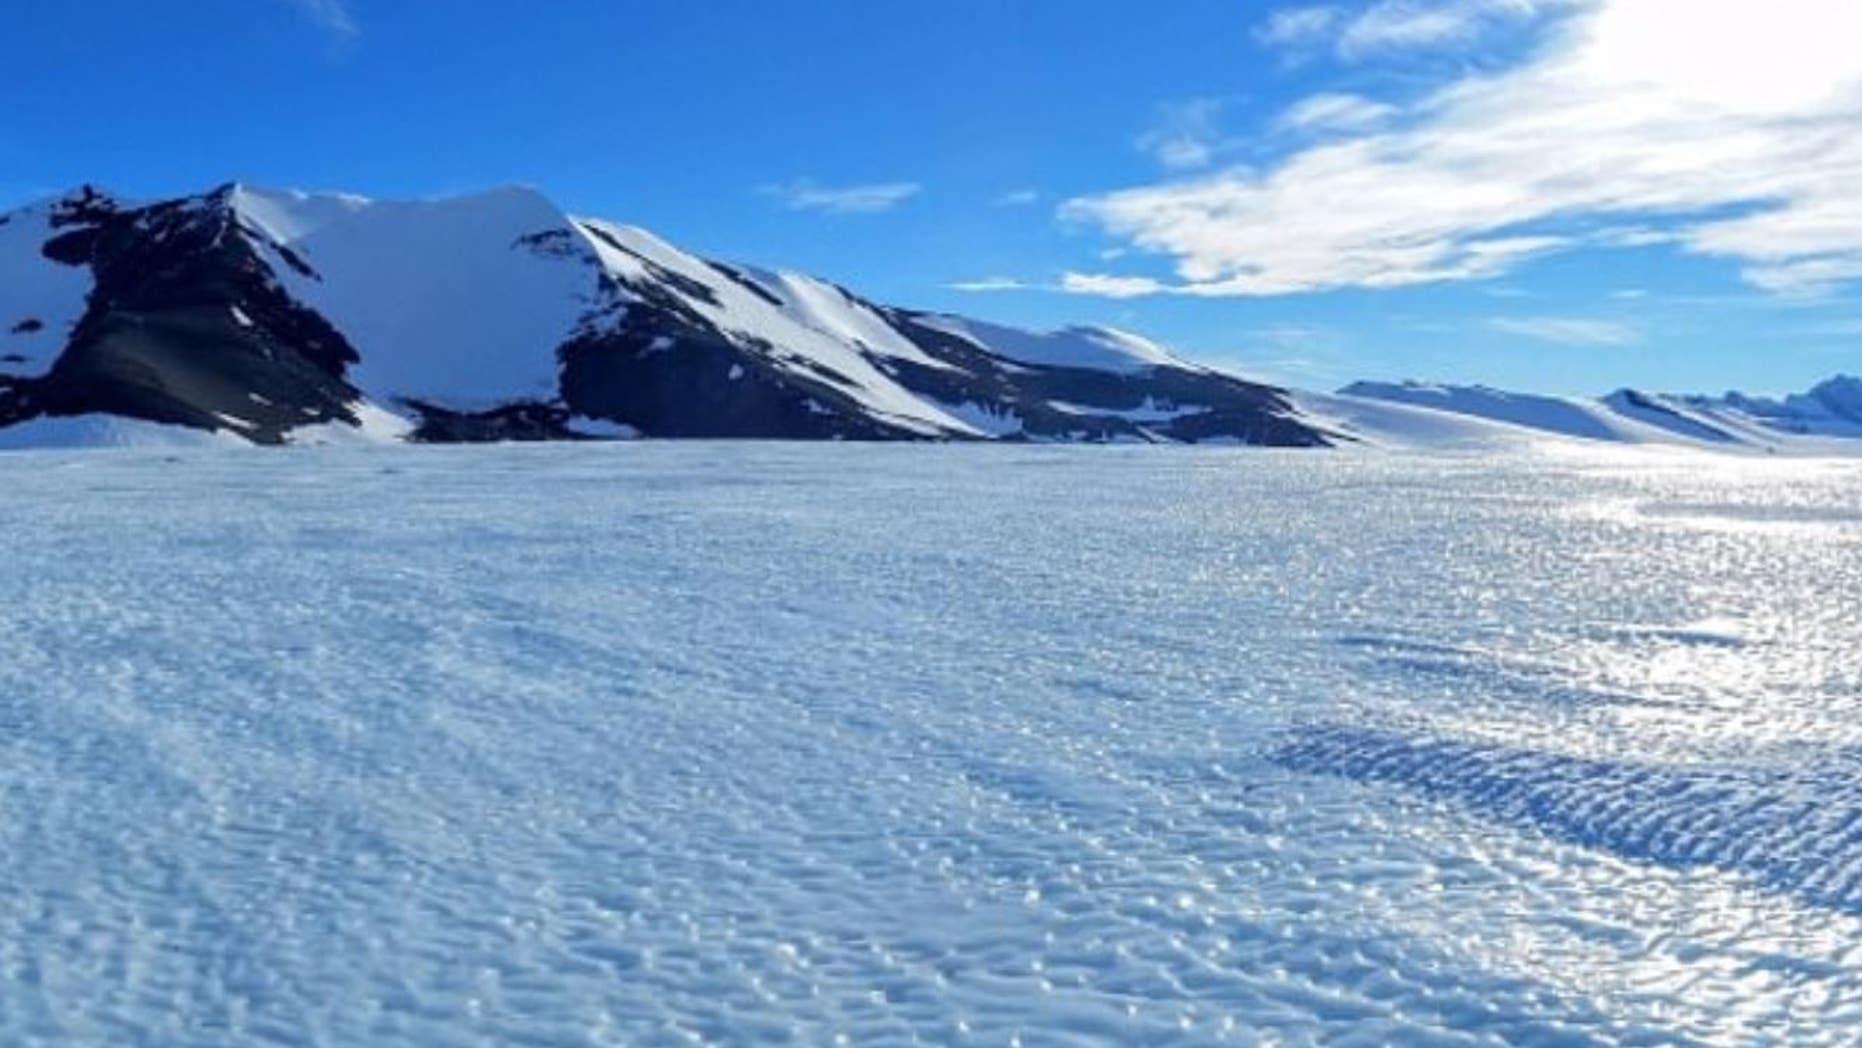 Pictured above, a blue ice area in Antarctica. (UNSW/AntarcticScience.com)